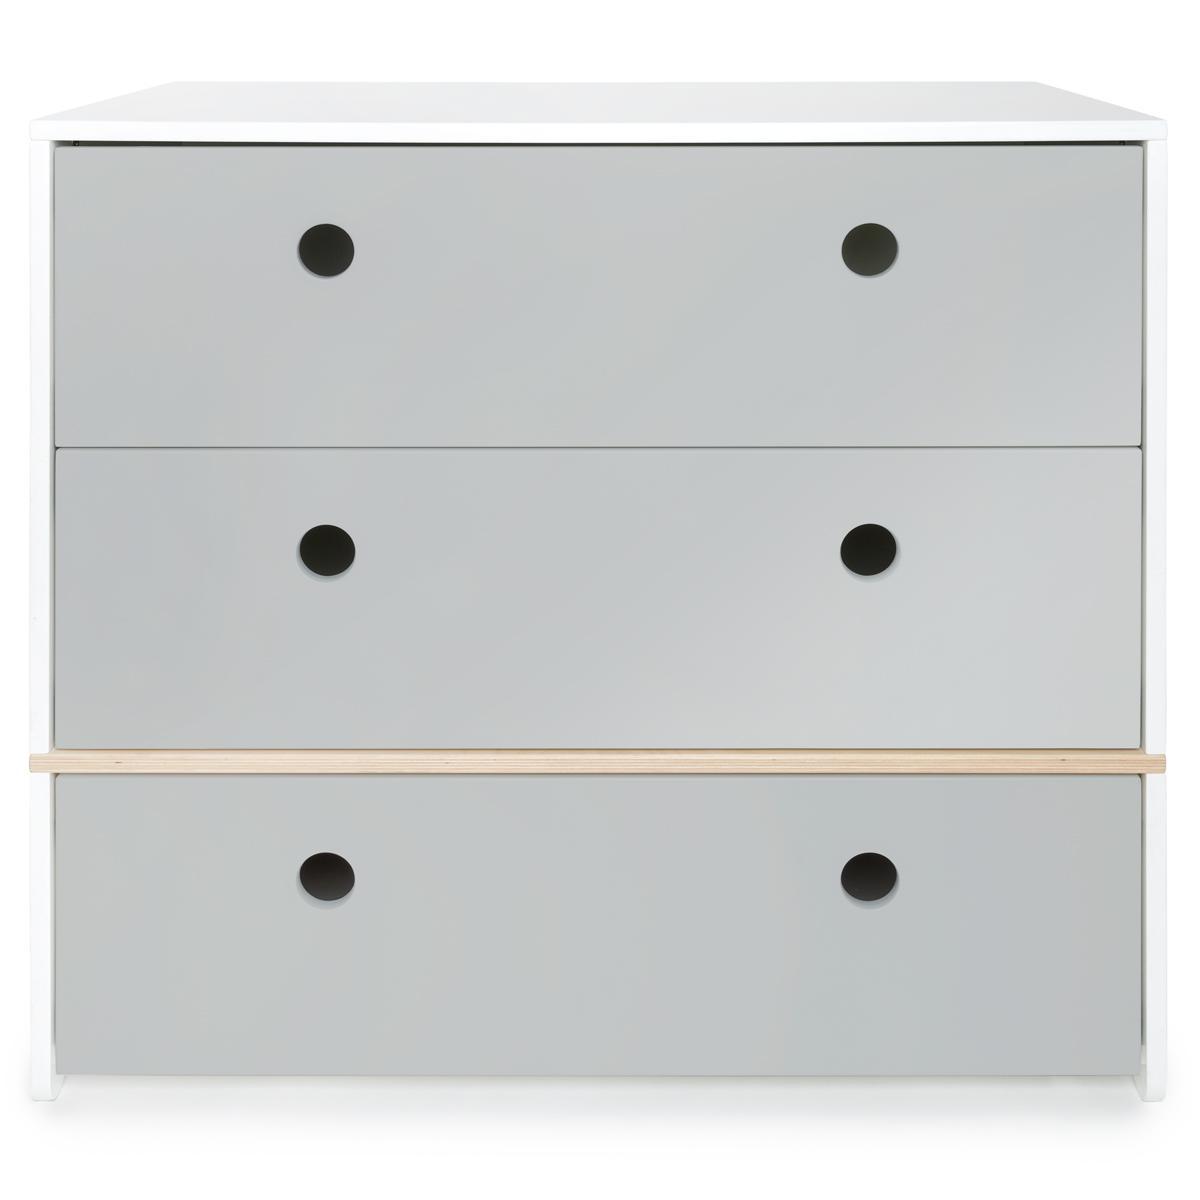 Kommode COLORFLEX Schubladen Farben pearl grey